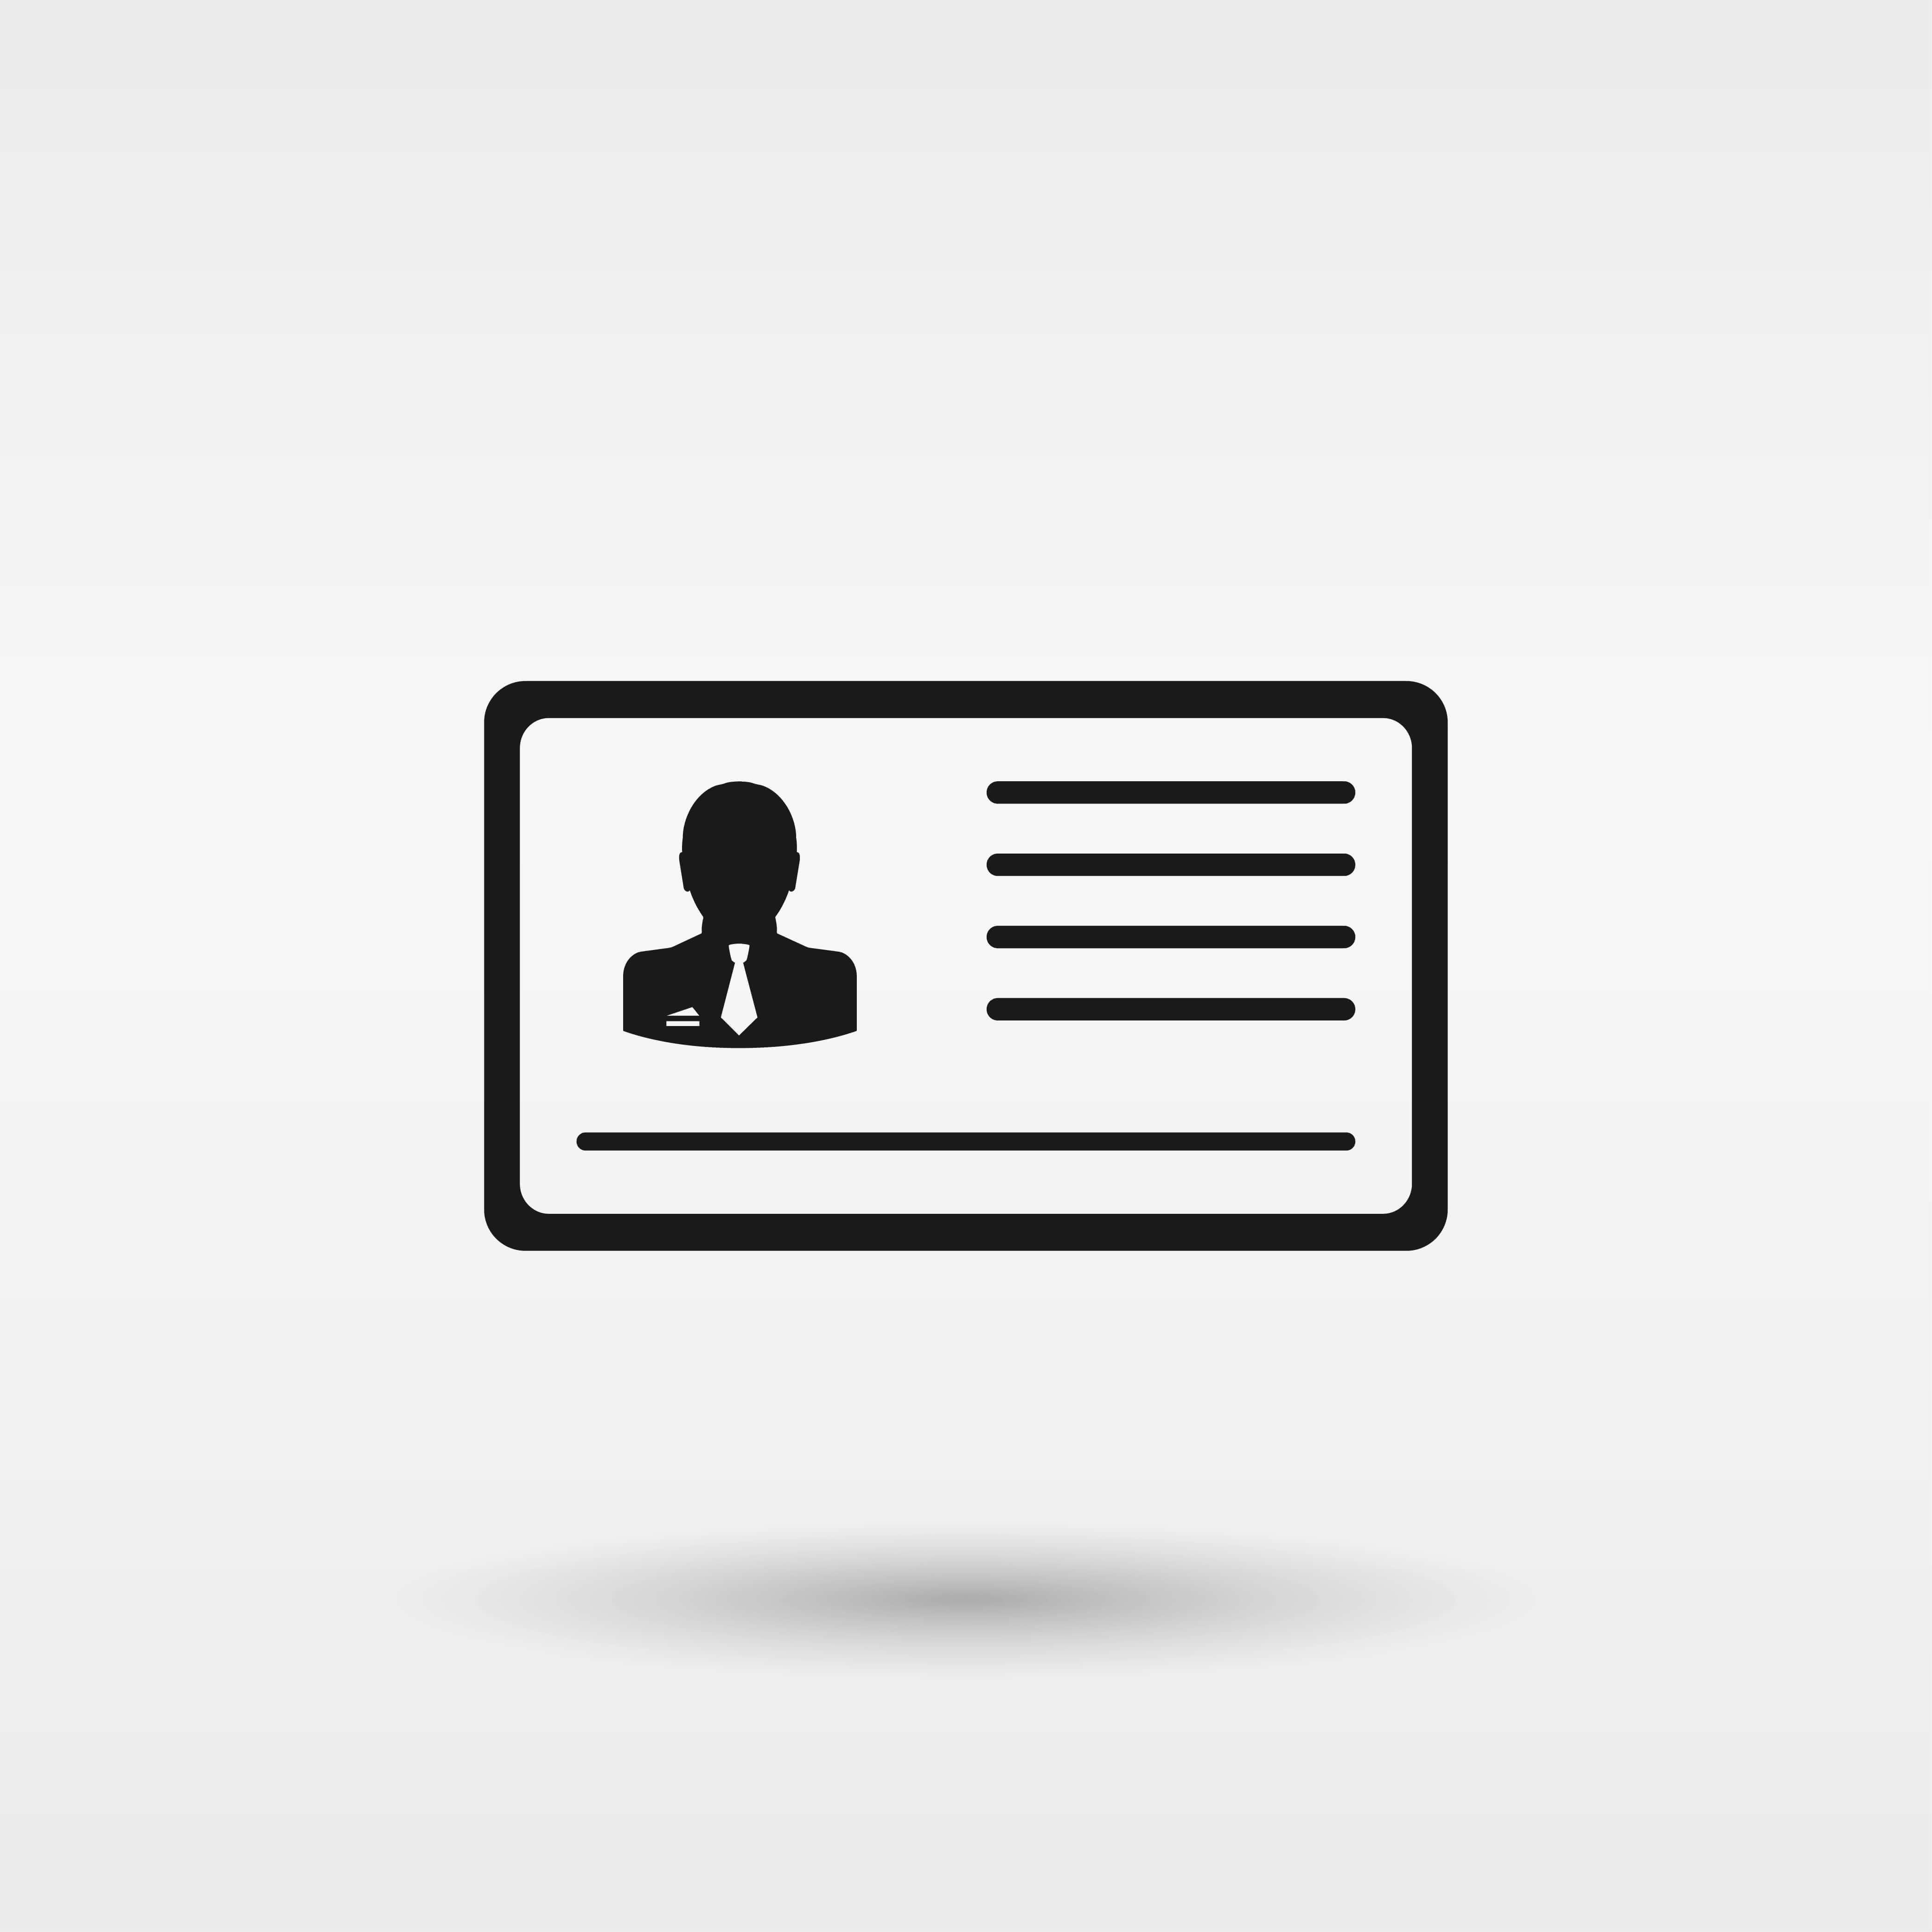 Le certificat d'immatriculation: à quoi ça sert?